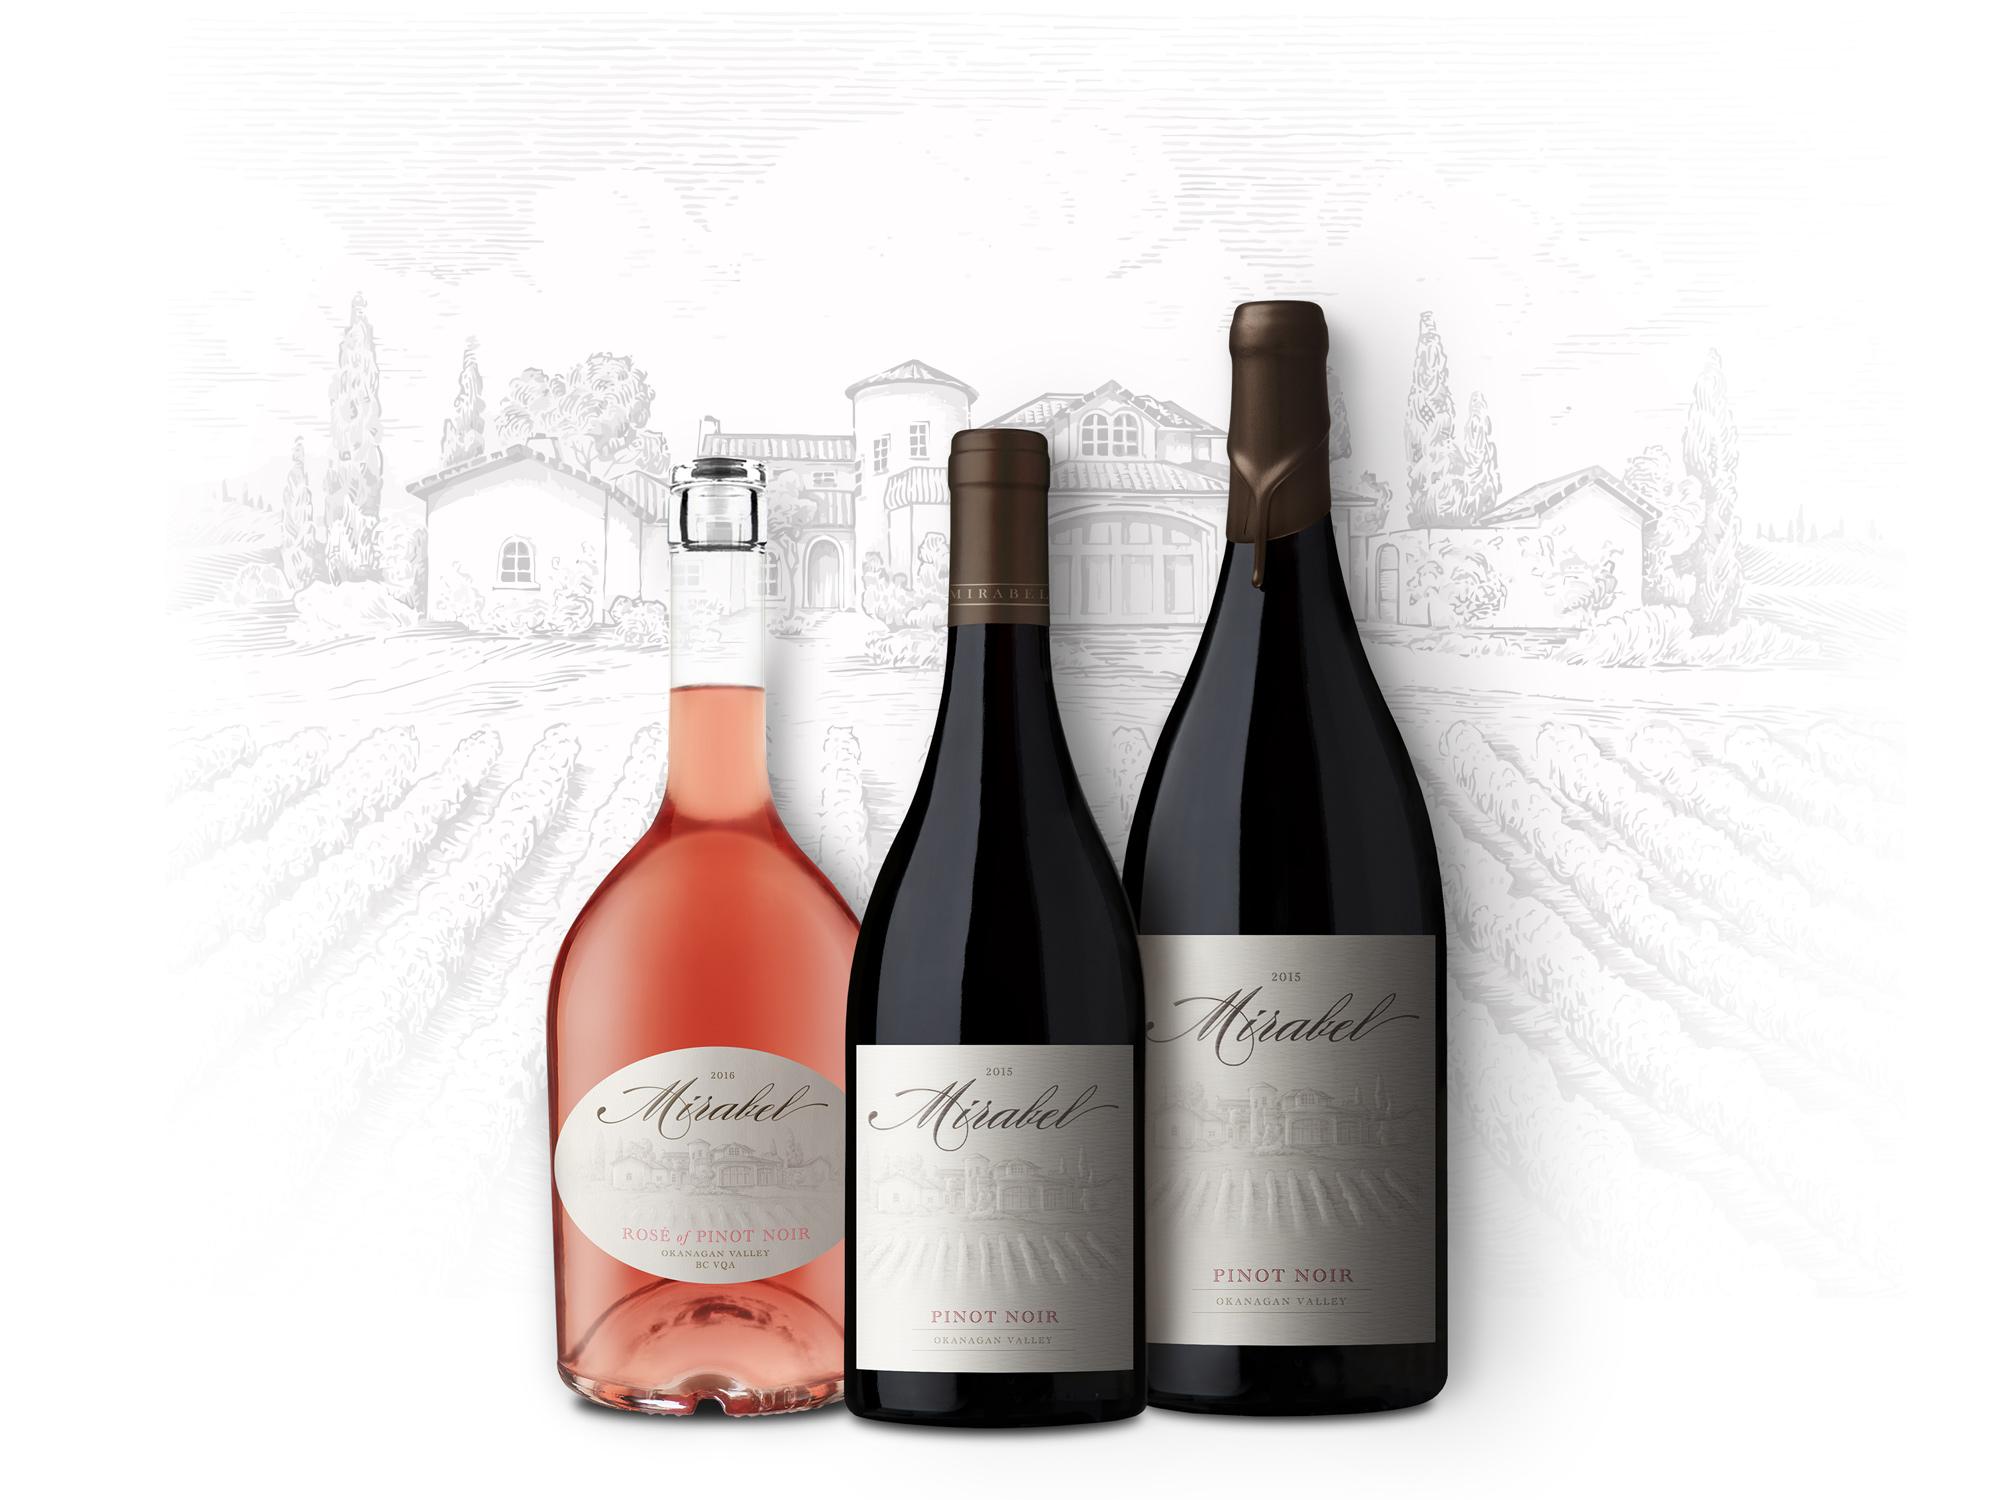 mirabel-vineyards-branding-bottle-shots.jpg